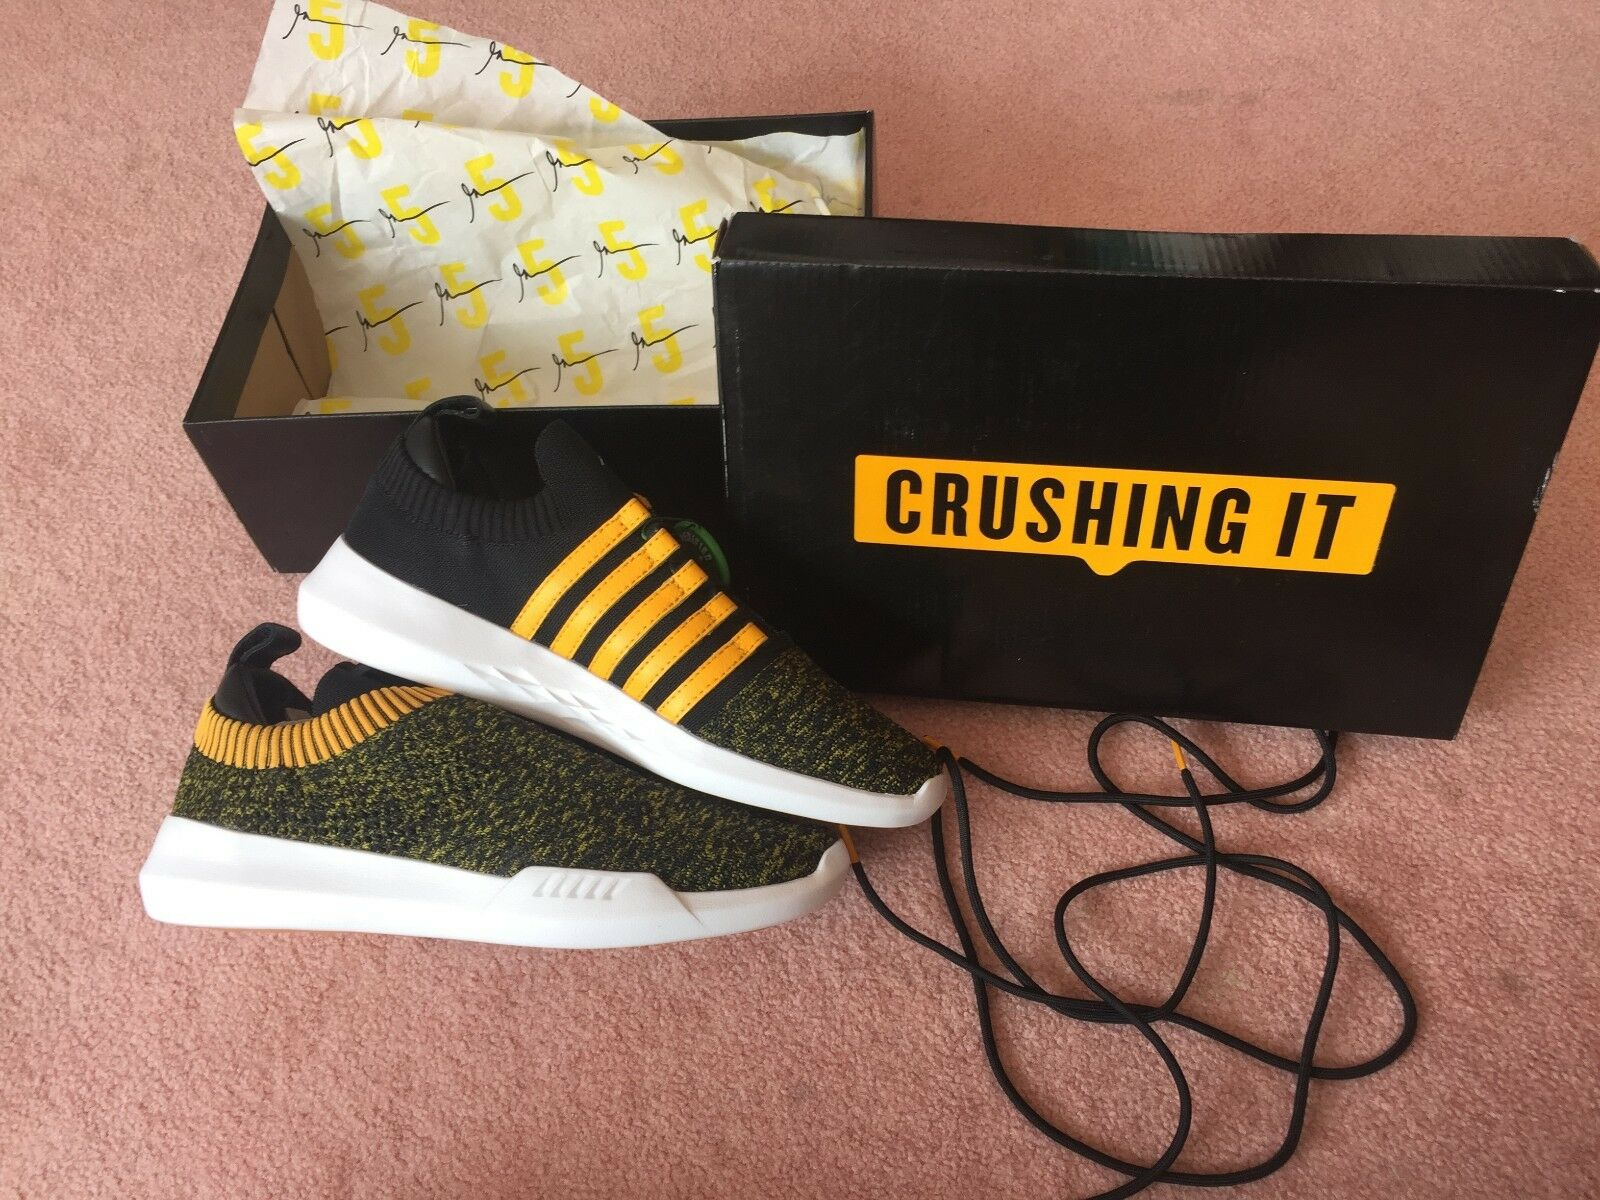 KSWISS GEN-K Icon KNIT GARY VEE 001 Crushing It GaryVee Sneaker Vaynerchuk Sz 9